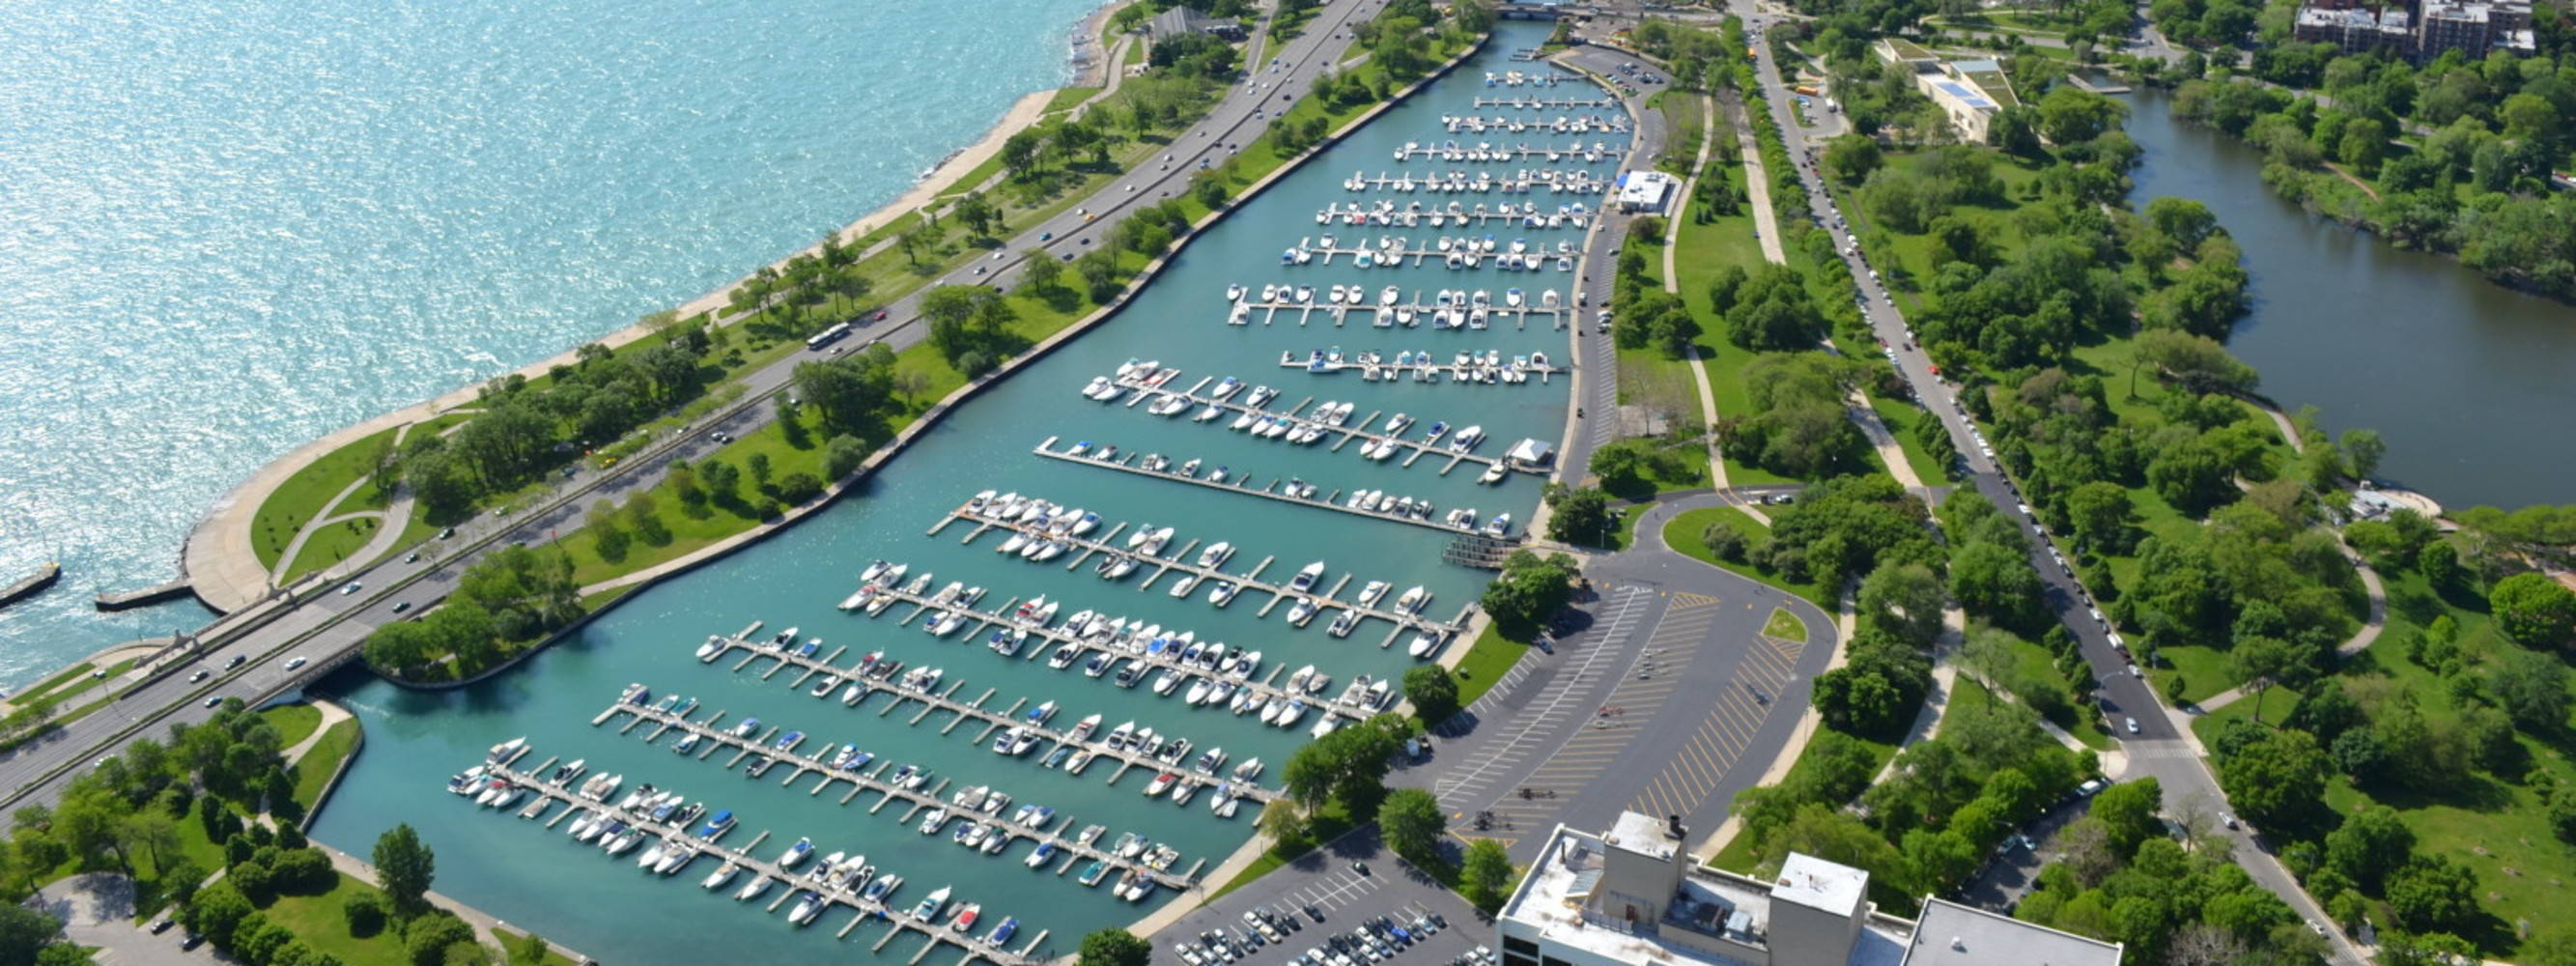 Diversey Harbor Lagoon The Chicago Harbors Slip Dock